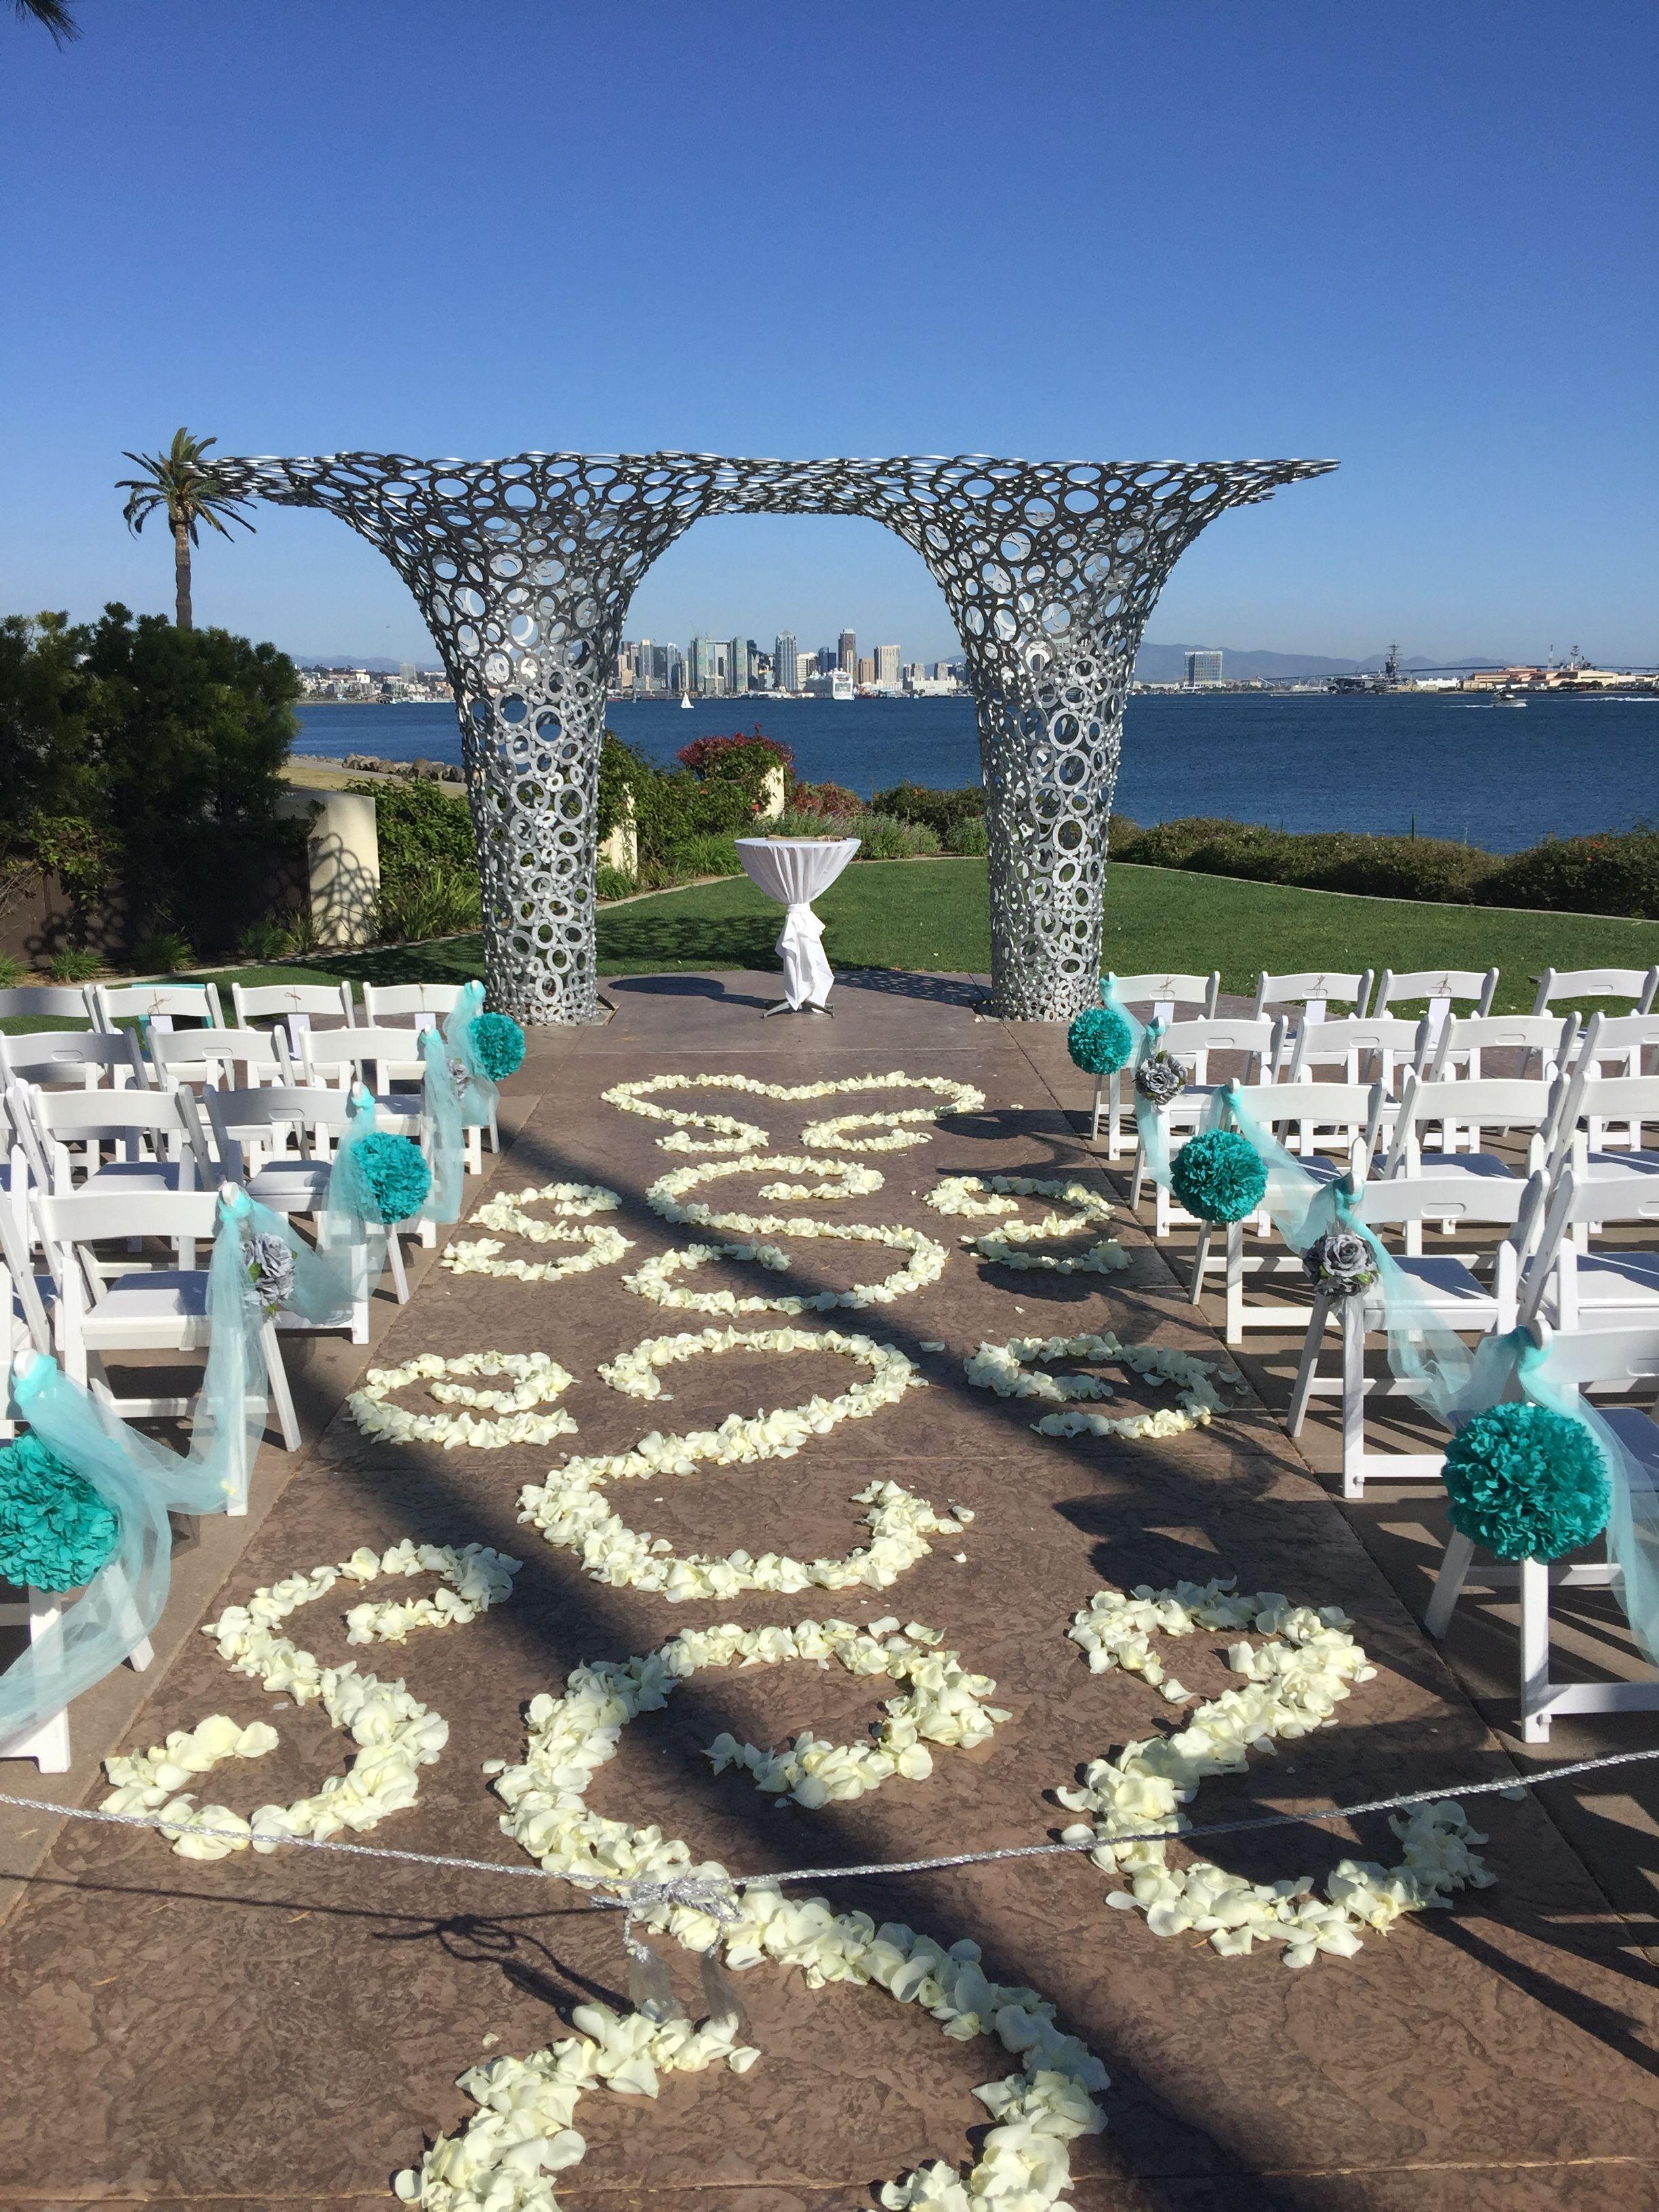 Beach wedding venues in san diego  Pin by San Diego Destination Weddings on Photos  Pinterest  Photos